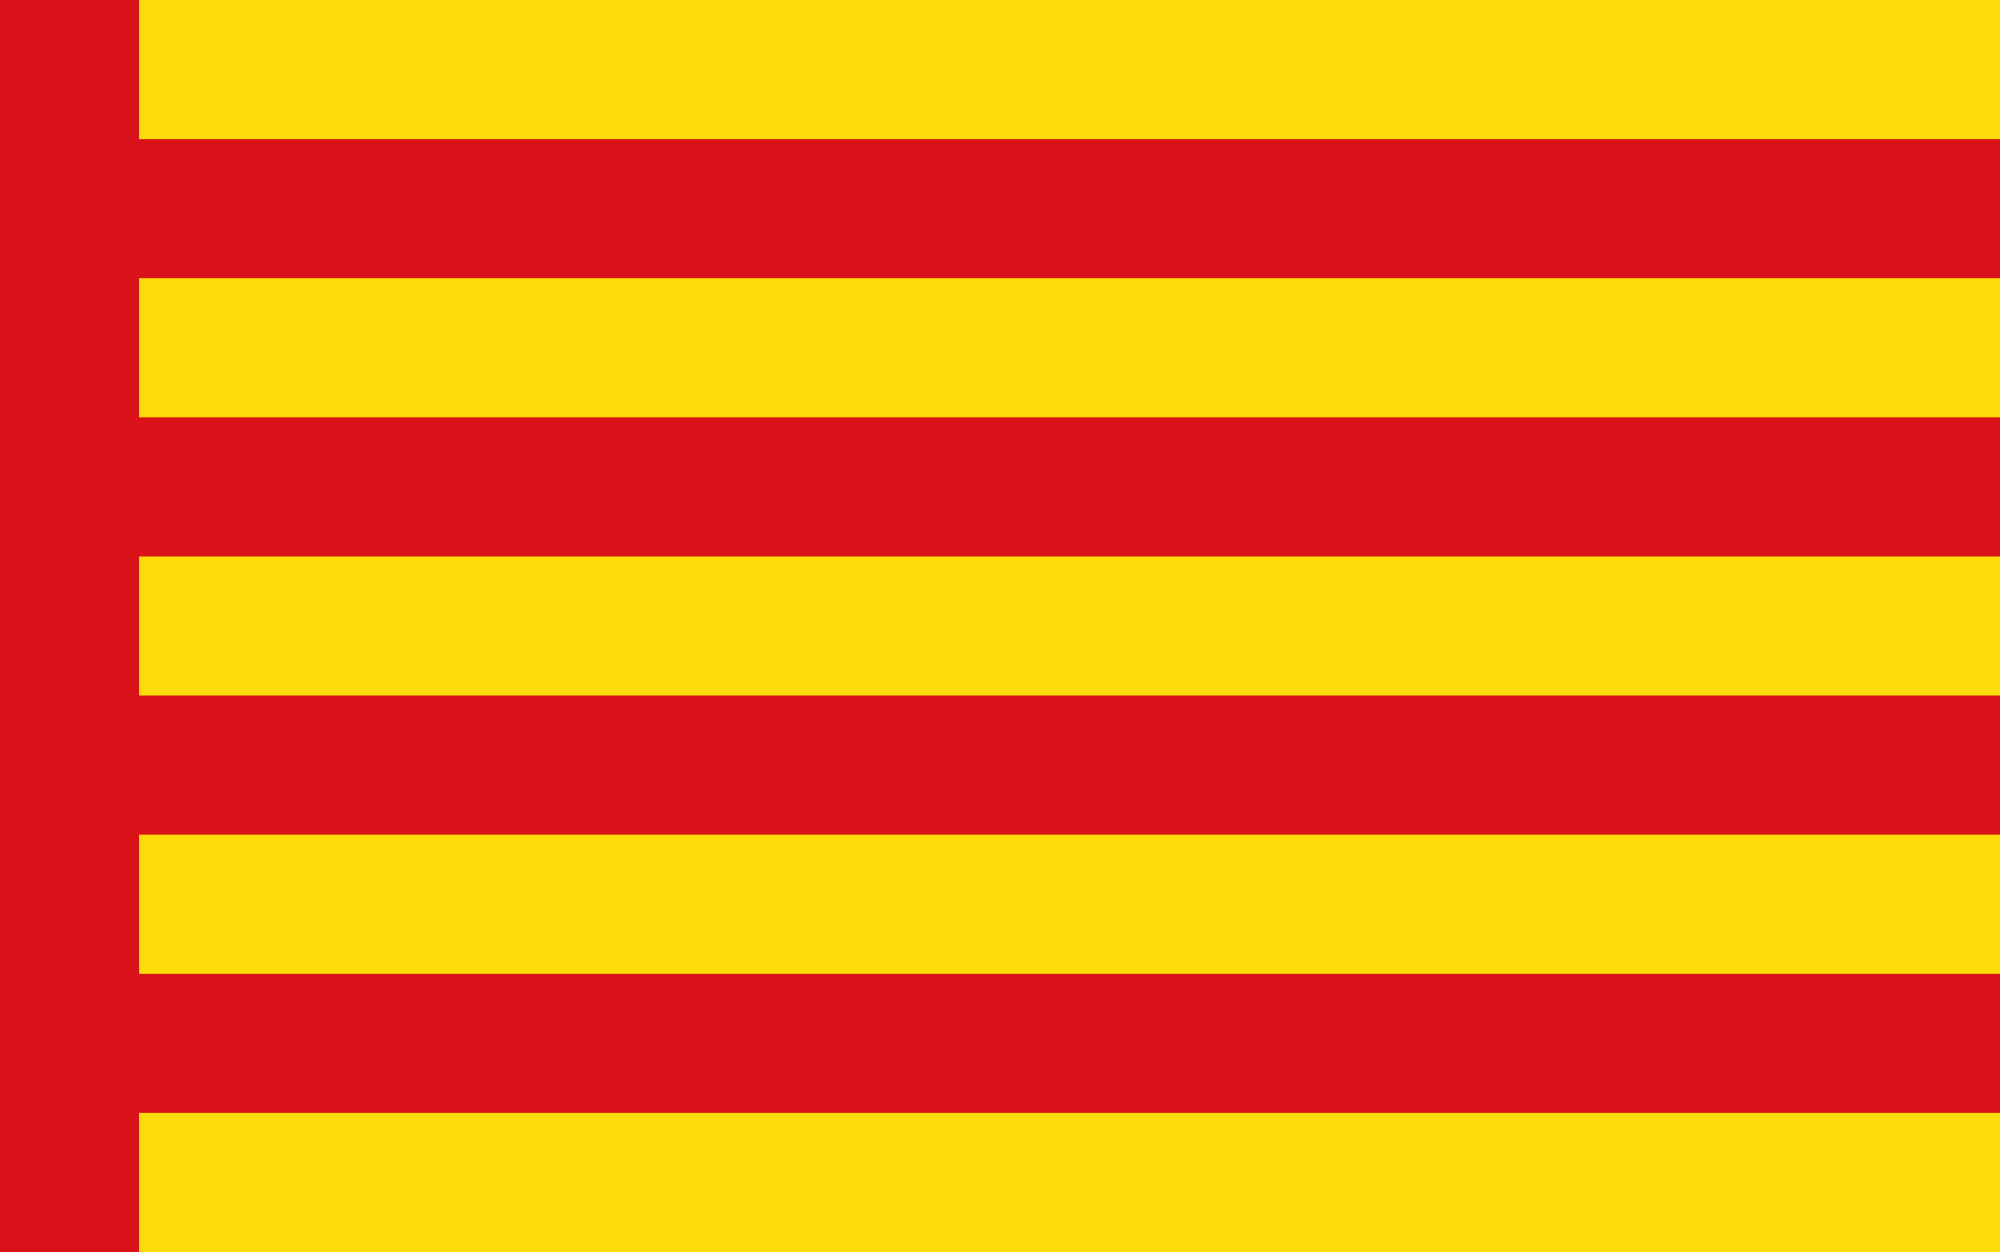 File:Bandera de Sagunt.svg.